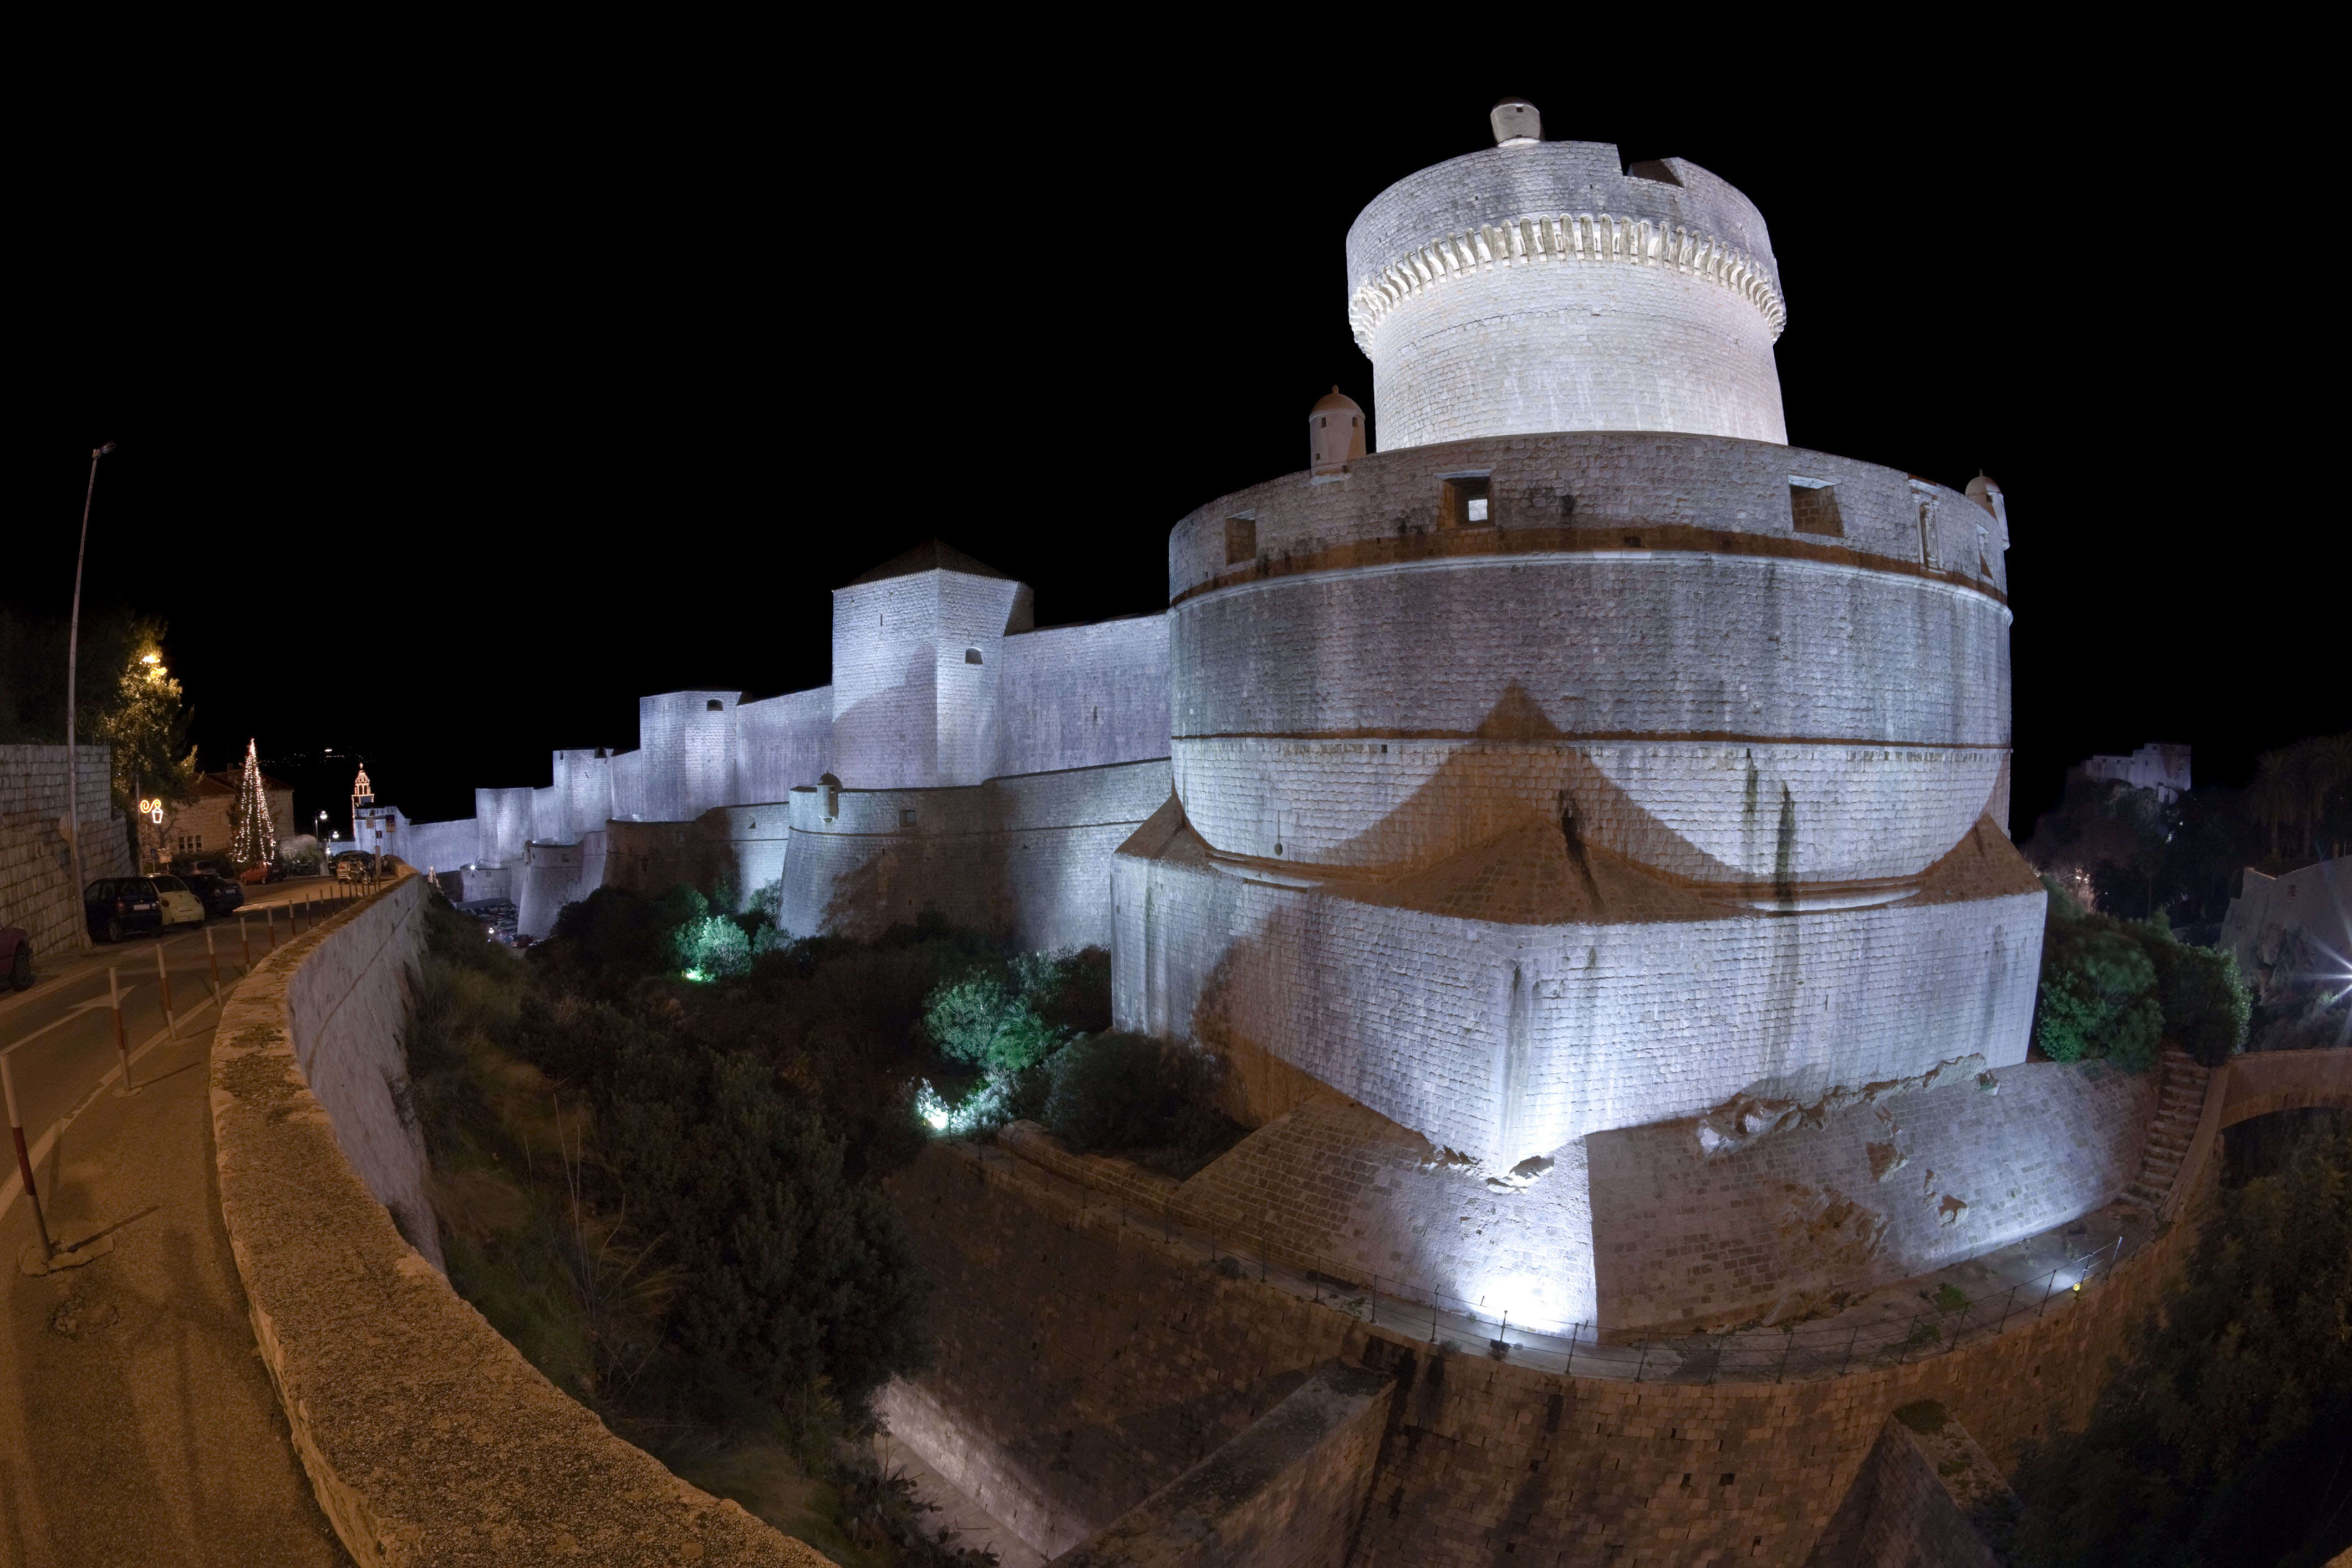 Dubrovnik's walls